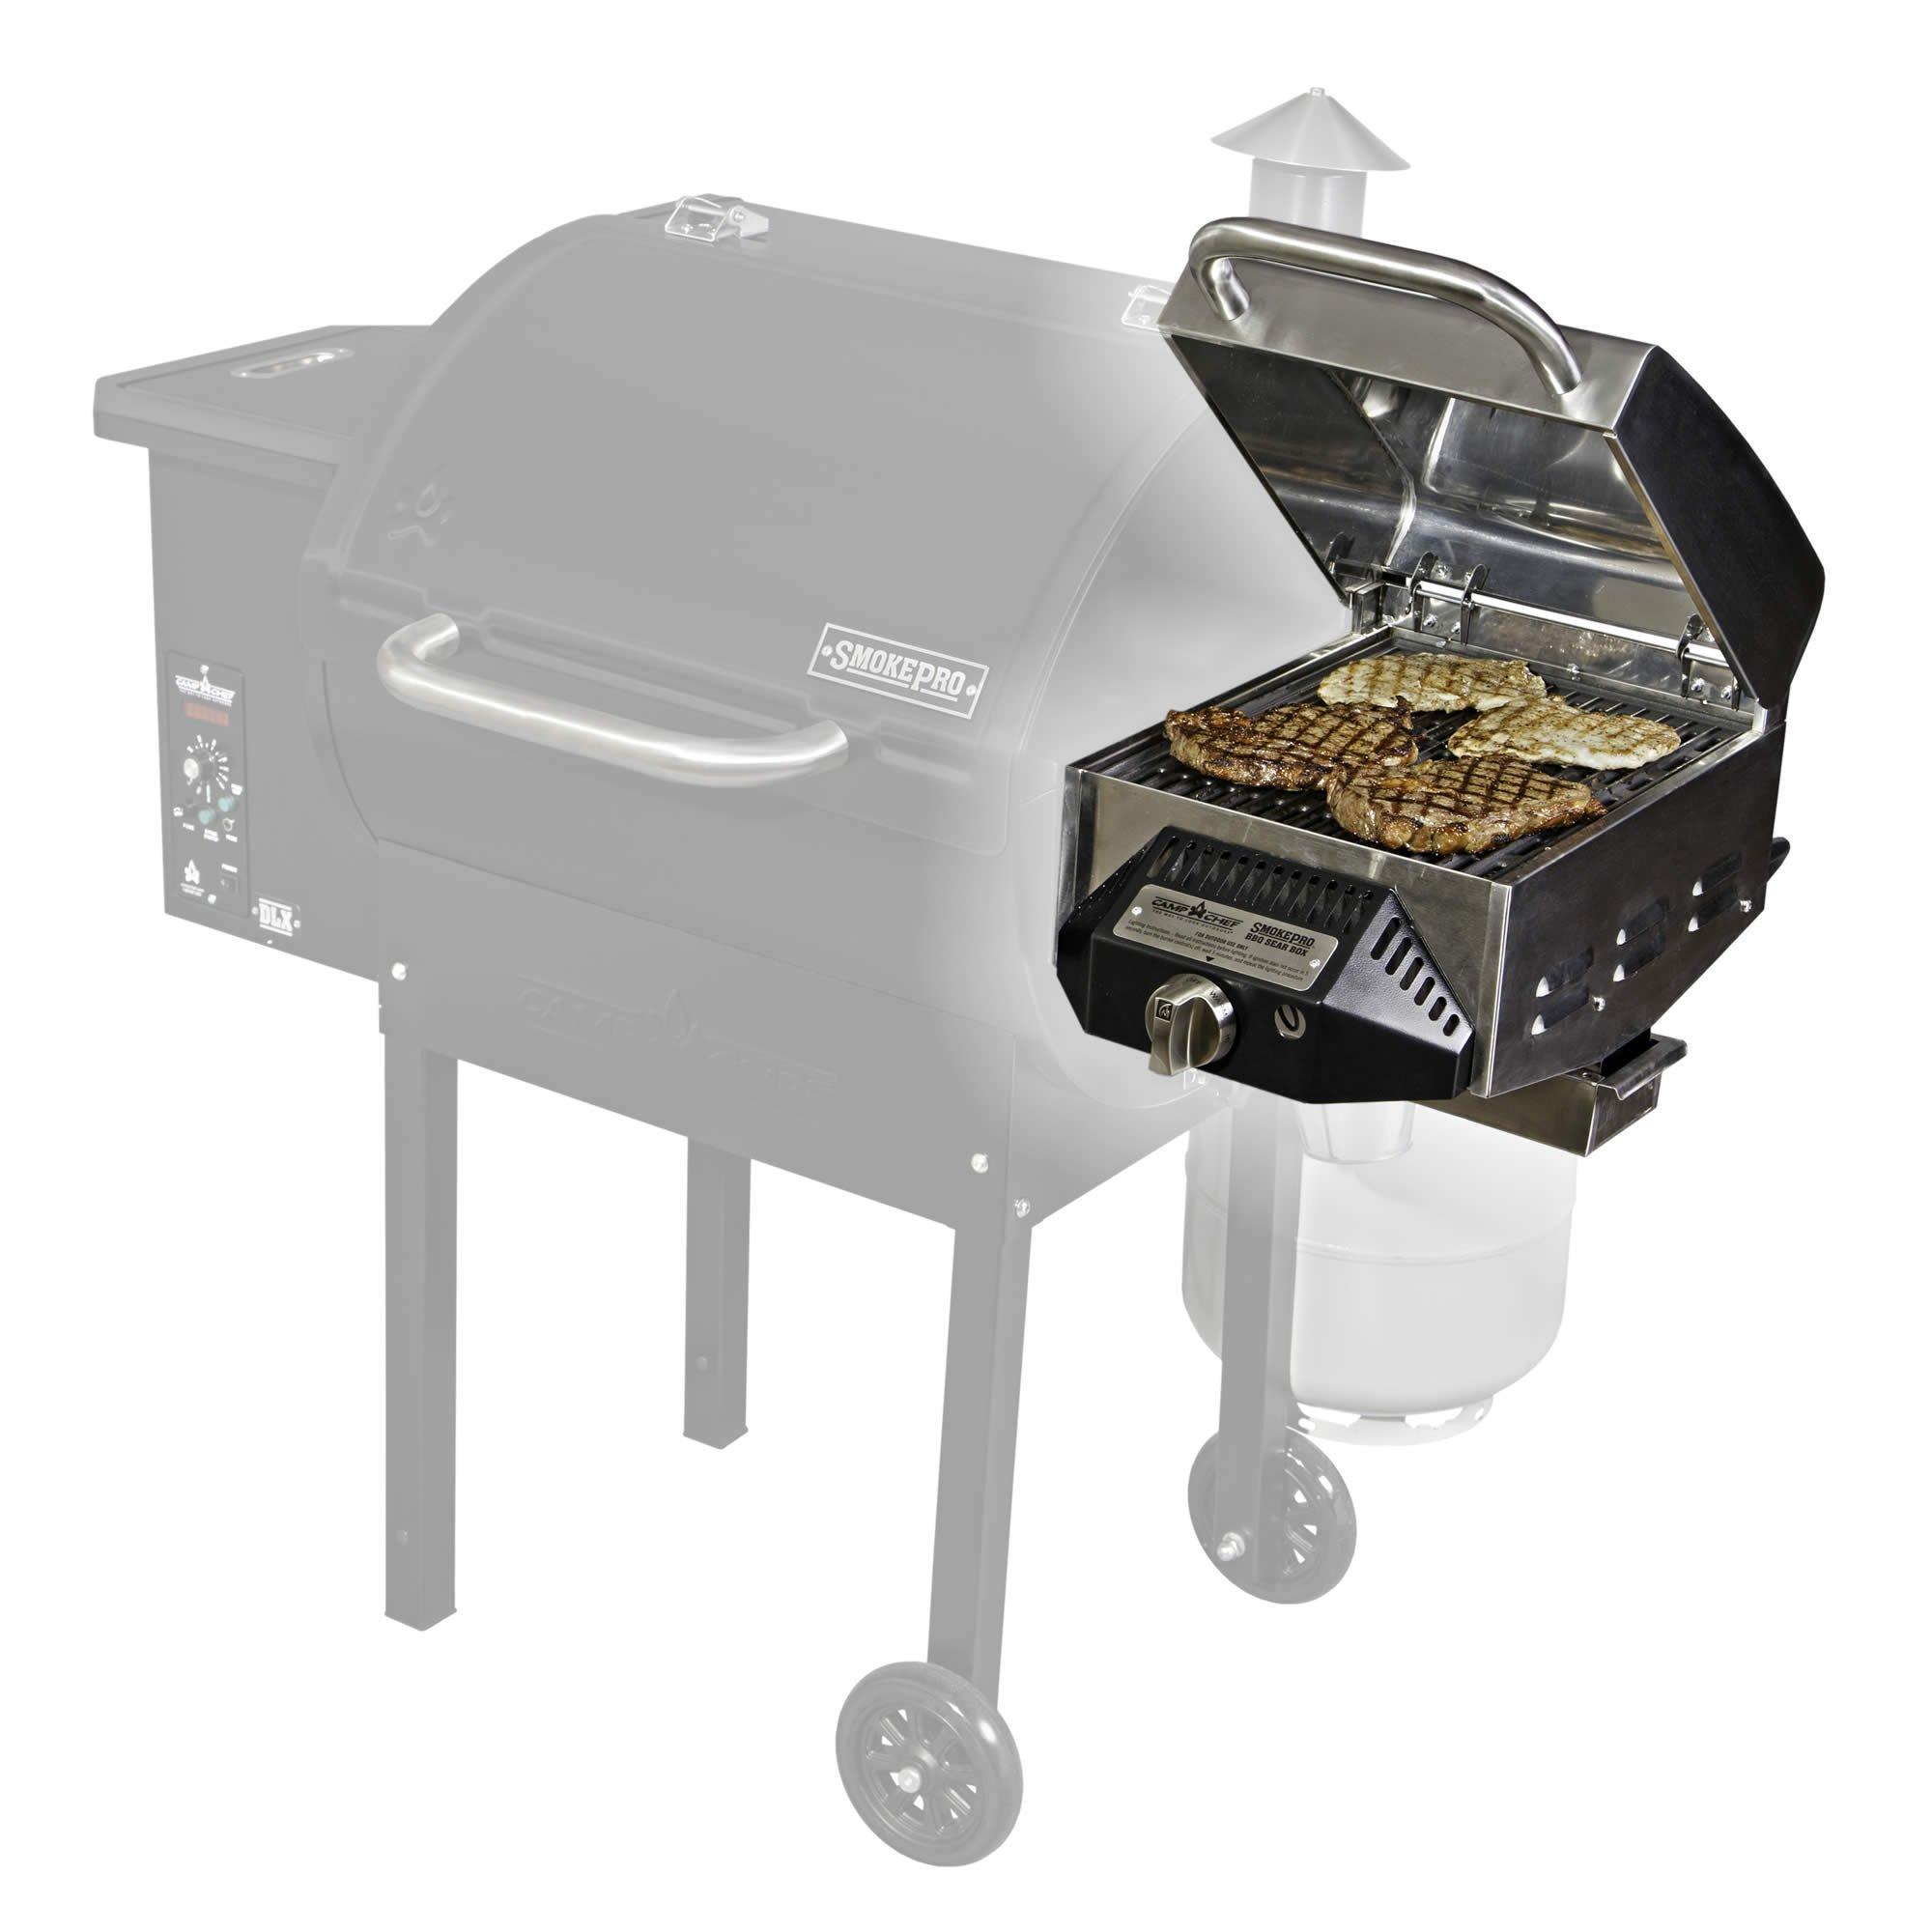 Camp Chef SmokePro BBQ Sear Box by Camp Chef